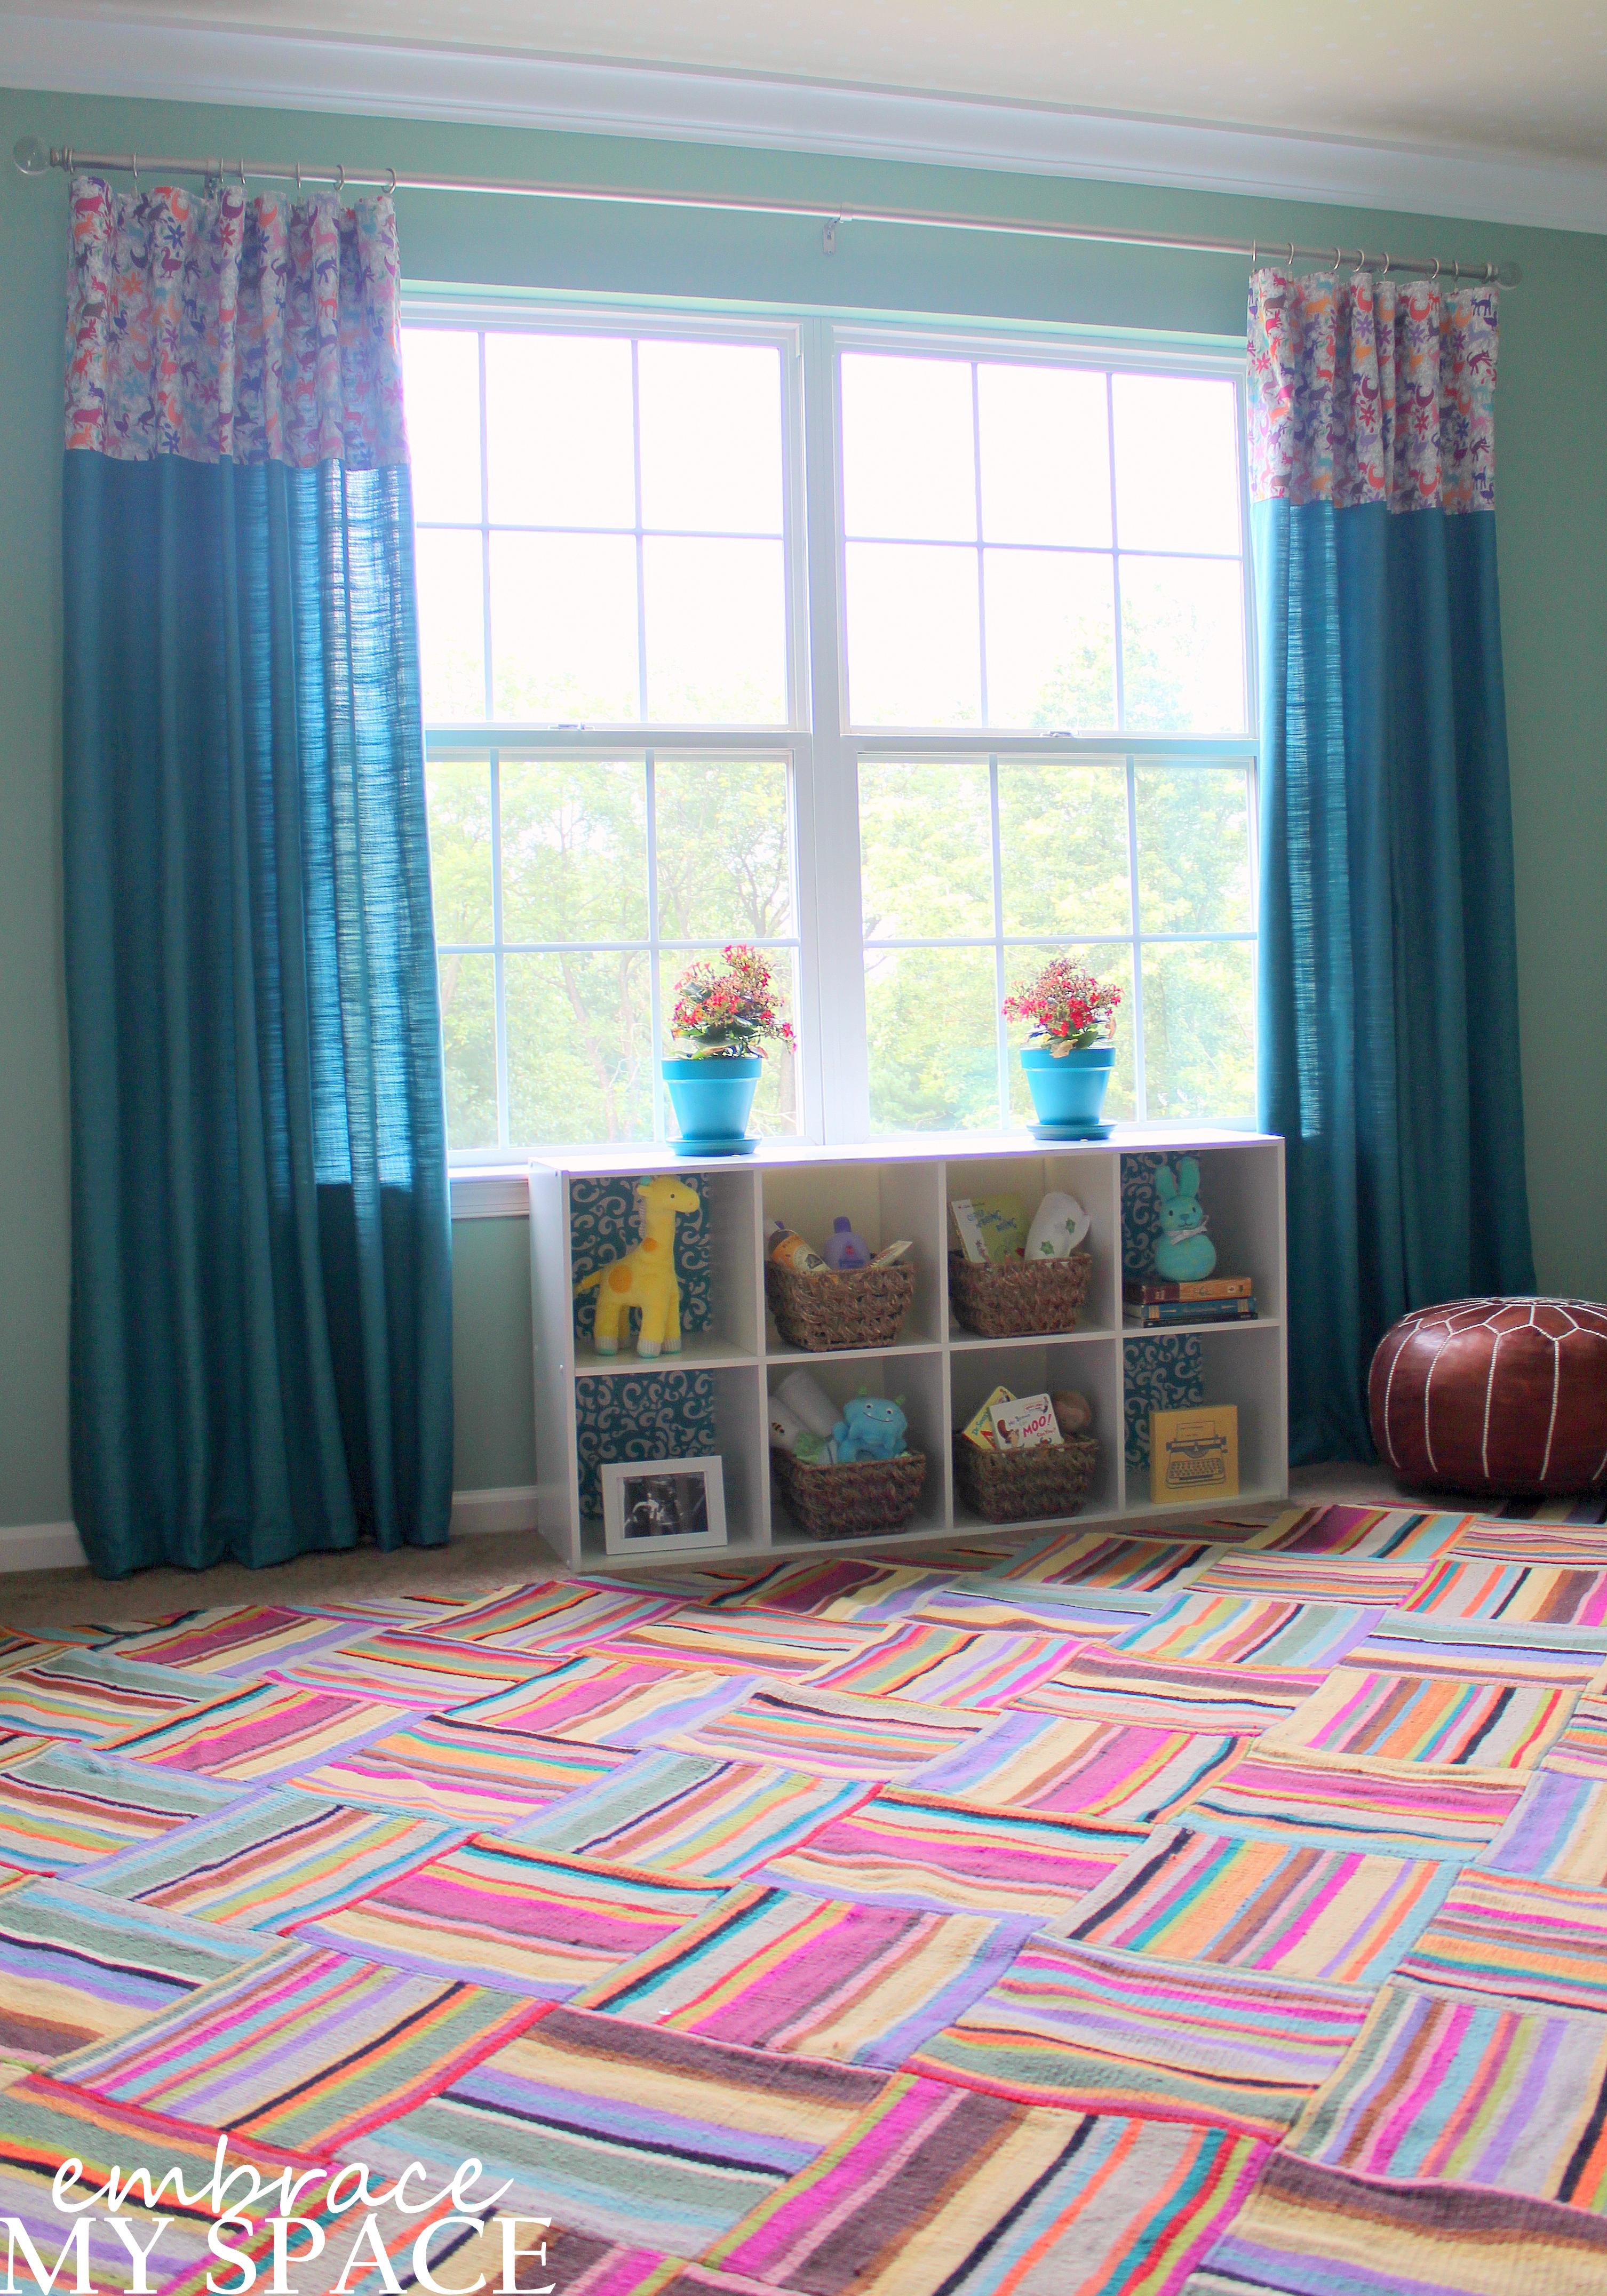 Embrace My Space Nursery & Nursery Storage: Outside the Box | embrace my space